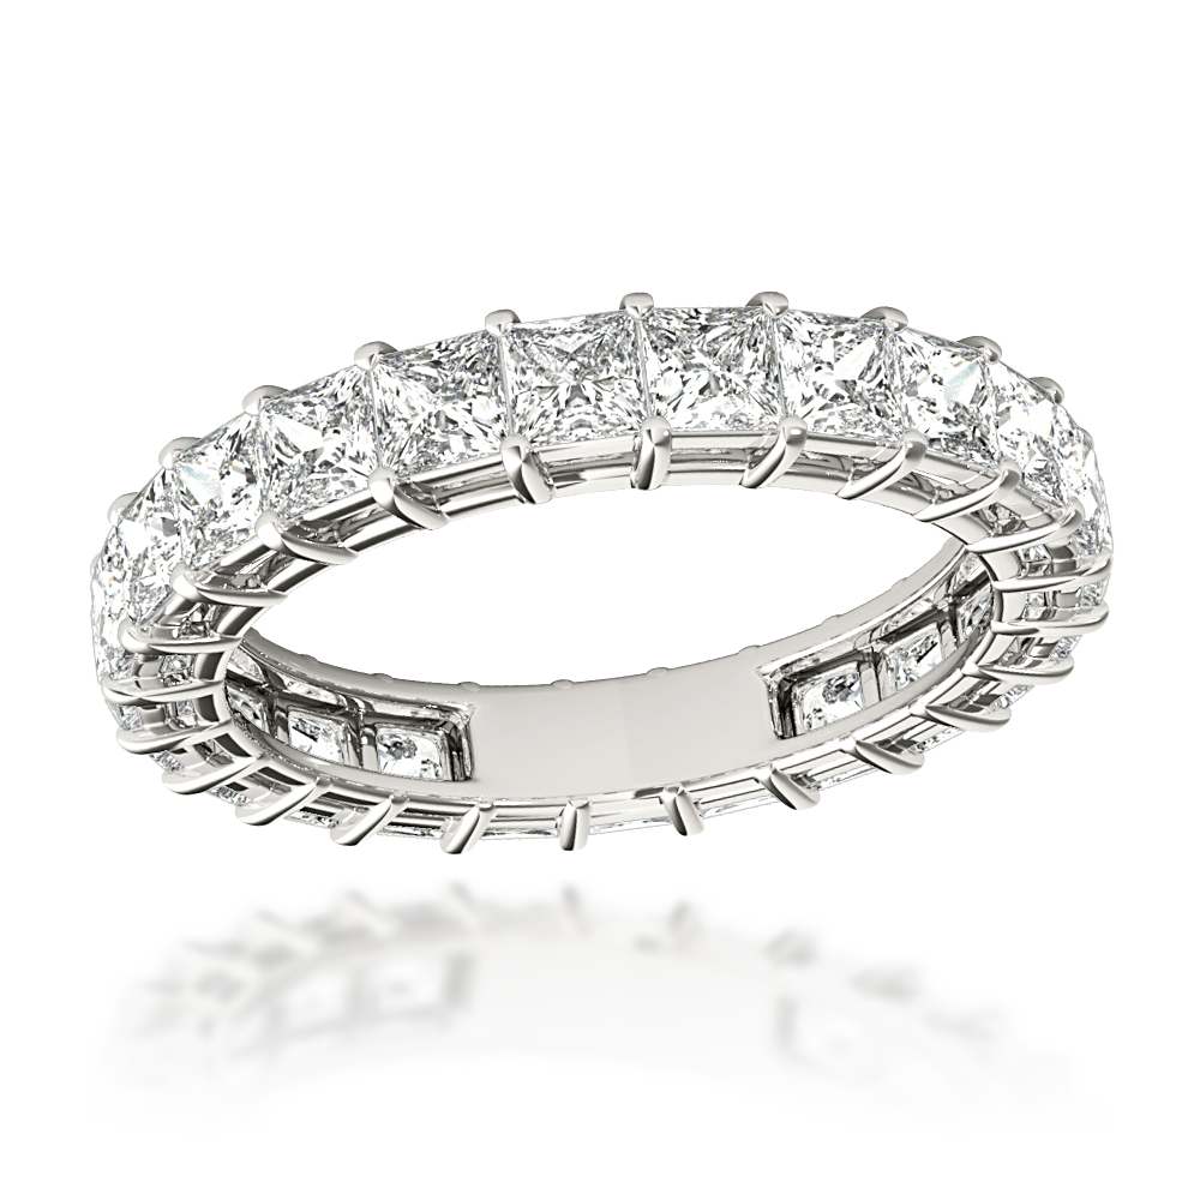 Platinum Cushion Cut Diamond Eternity Band Diamond Anniversary Ring 3ct